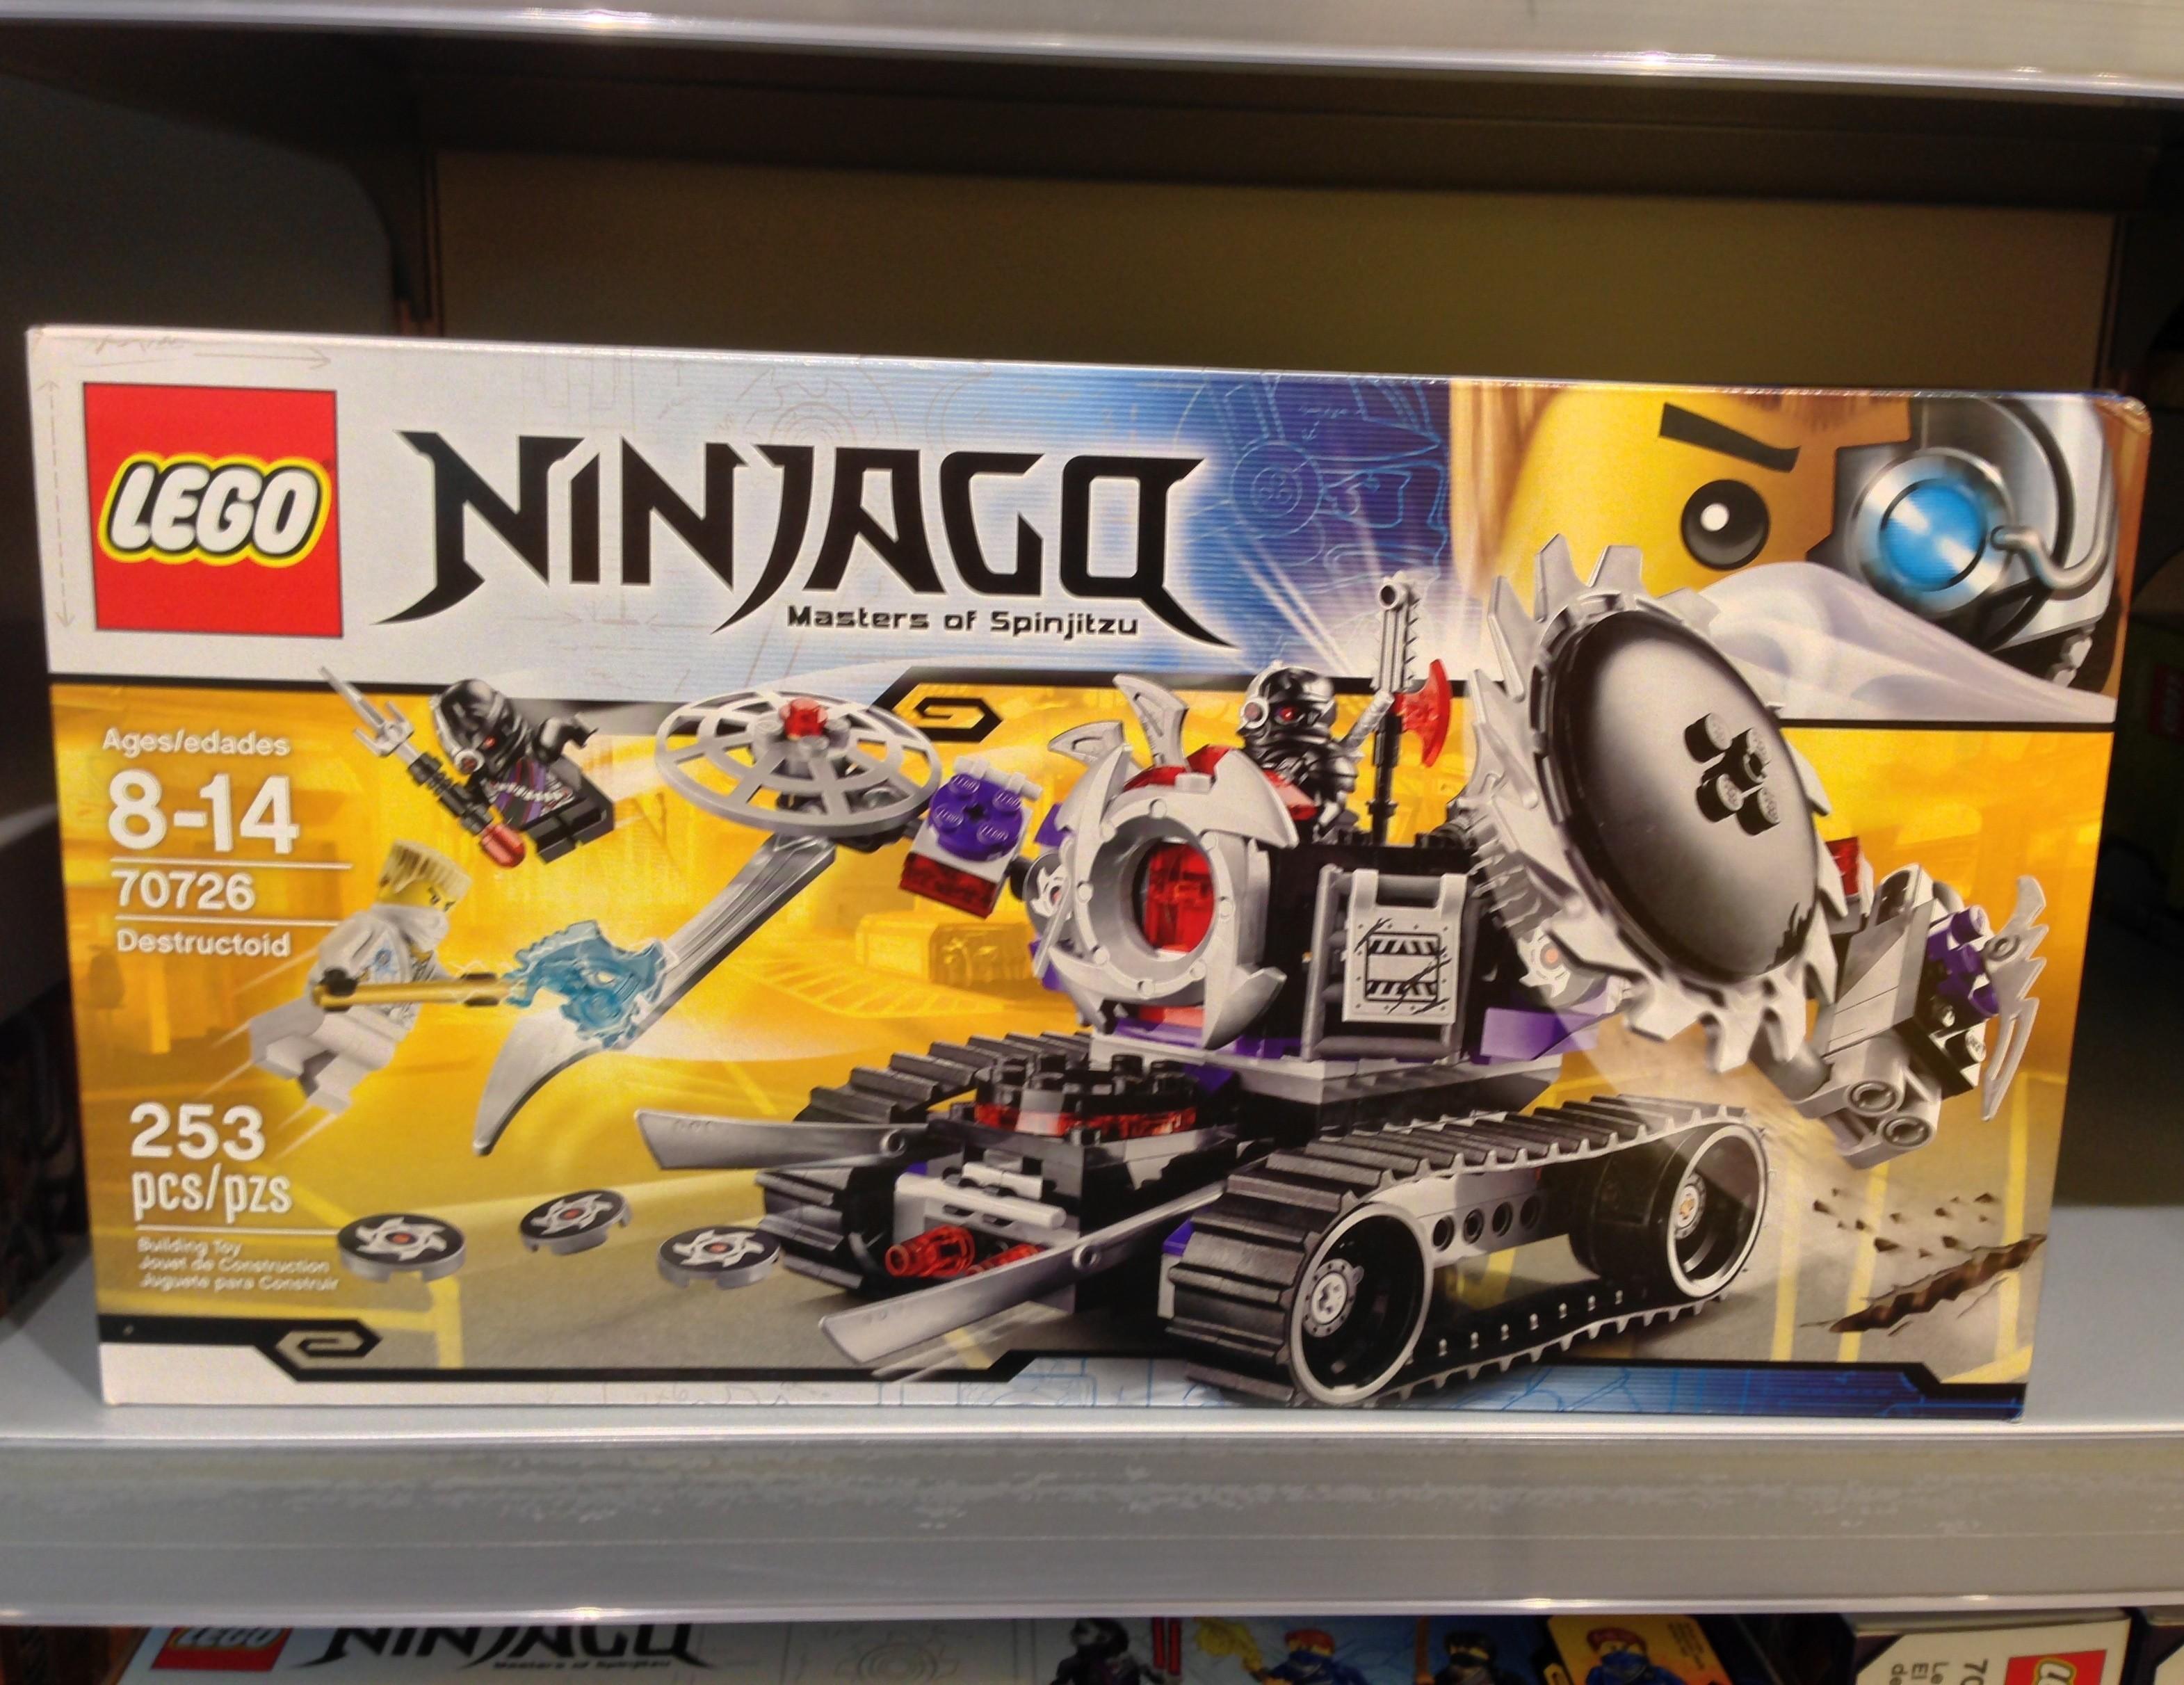 2014 LEGO 70726 Destructoid Ninjago Set Released in Stores ...